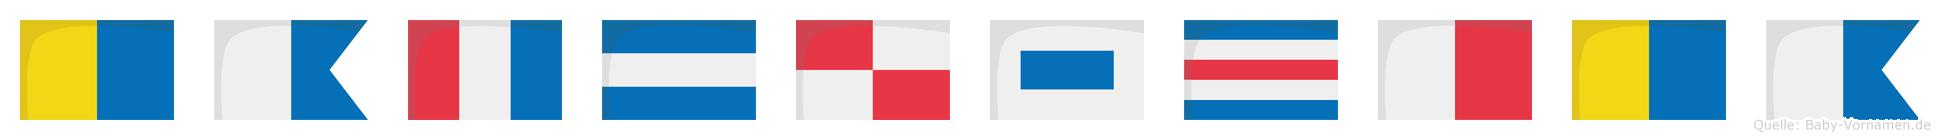 Katjuschka im Flaggenalphabet